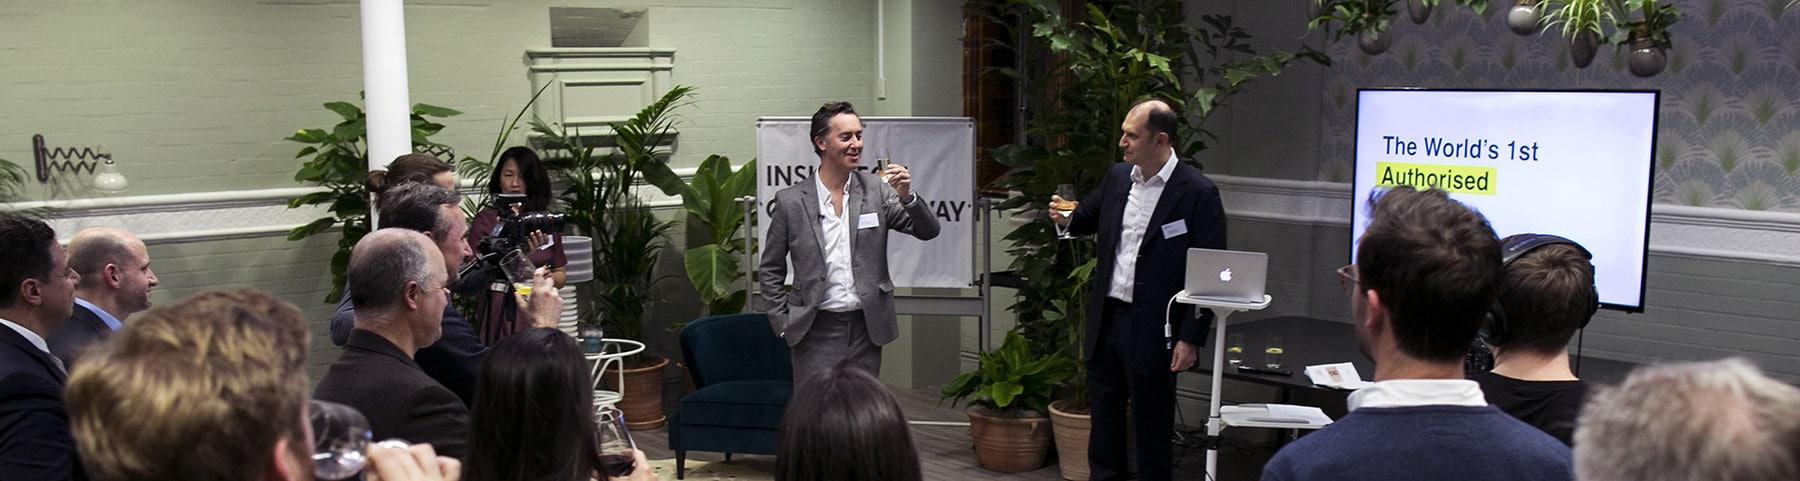 Insurtech Gateway incubator